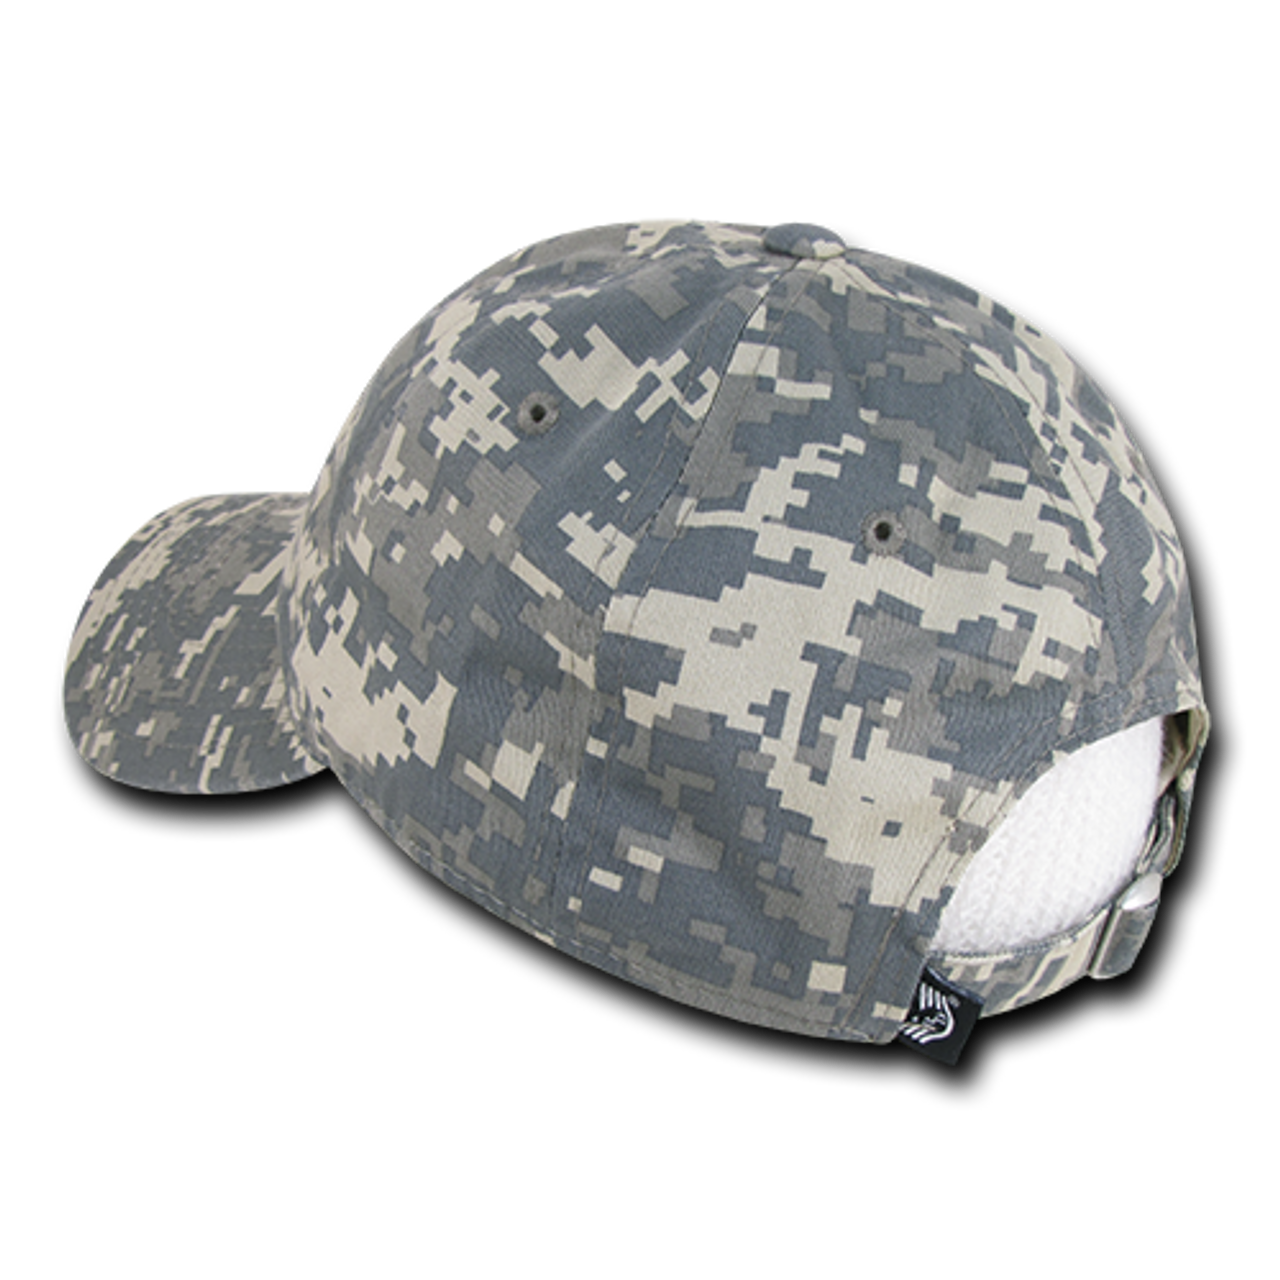 A03 - Tactical Operator Cap Tonal Flag ACU Digital Camouflage Relaxed